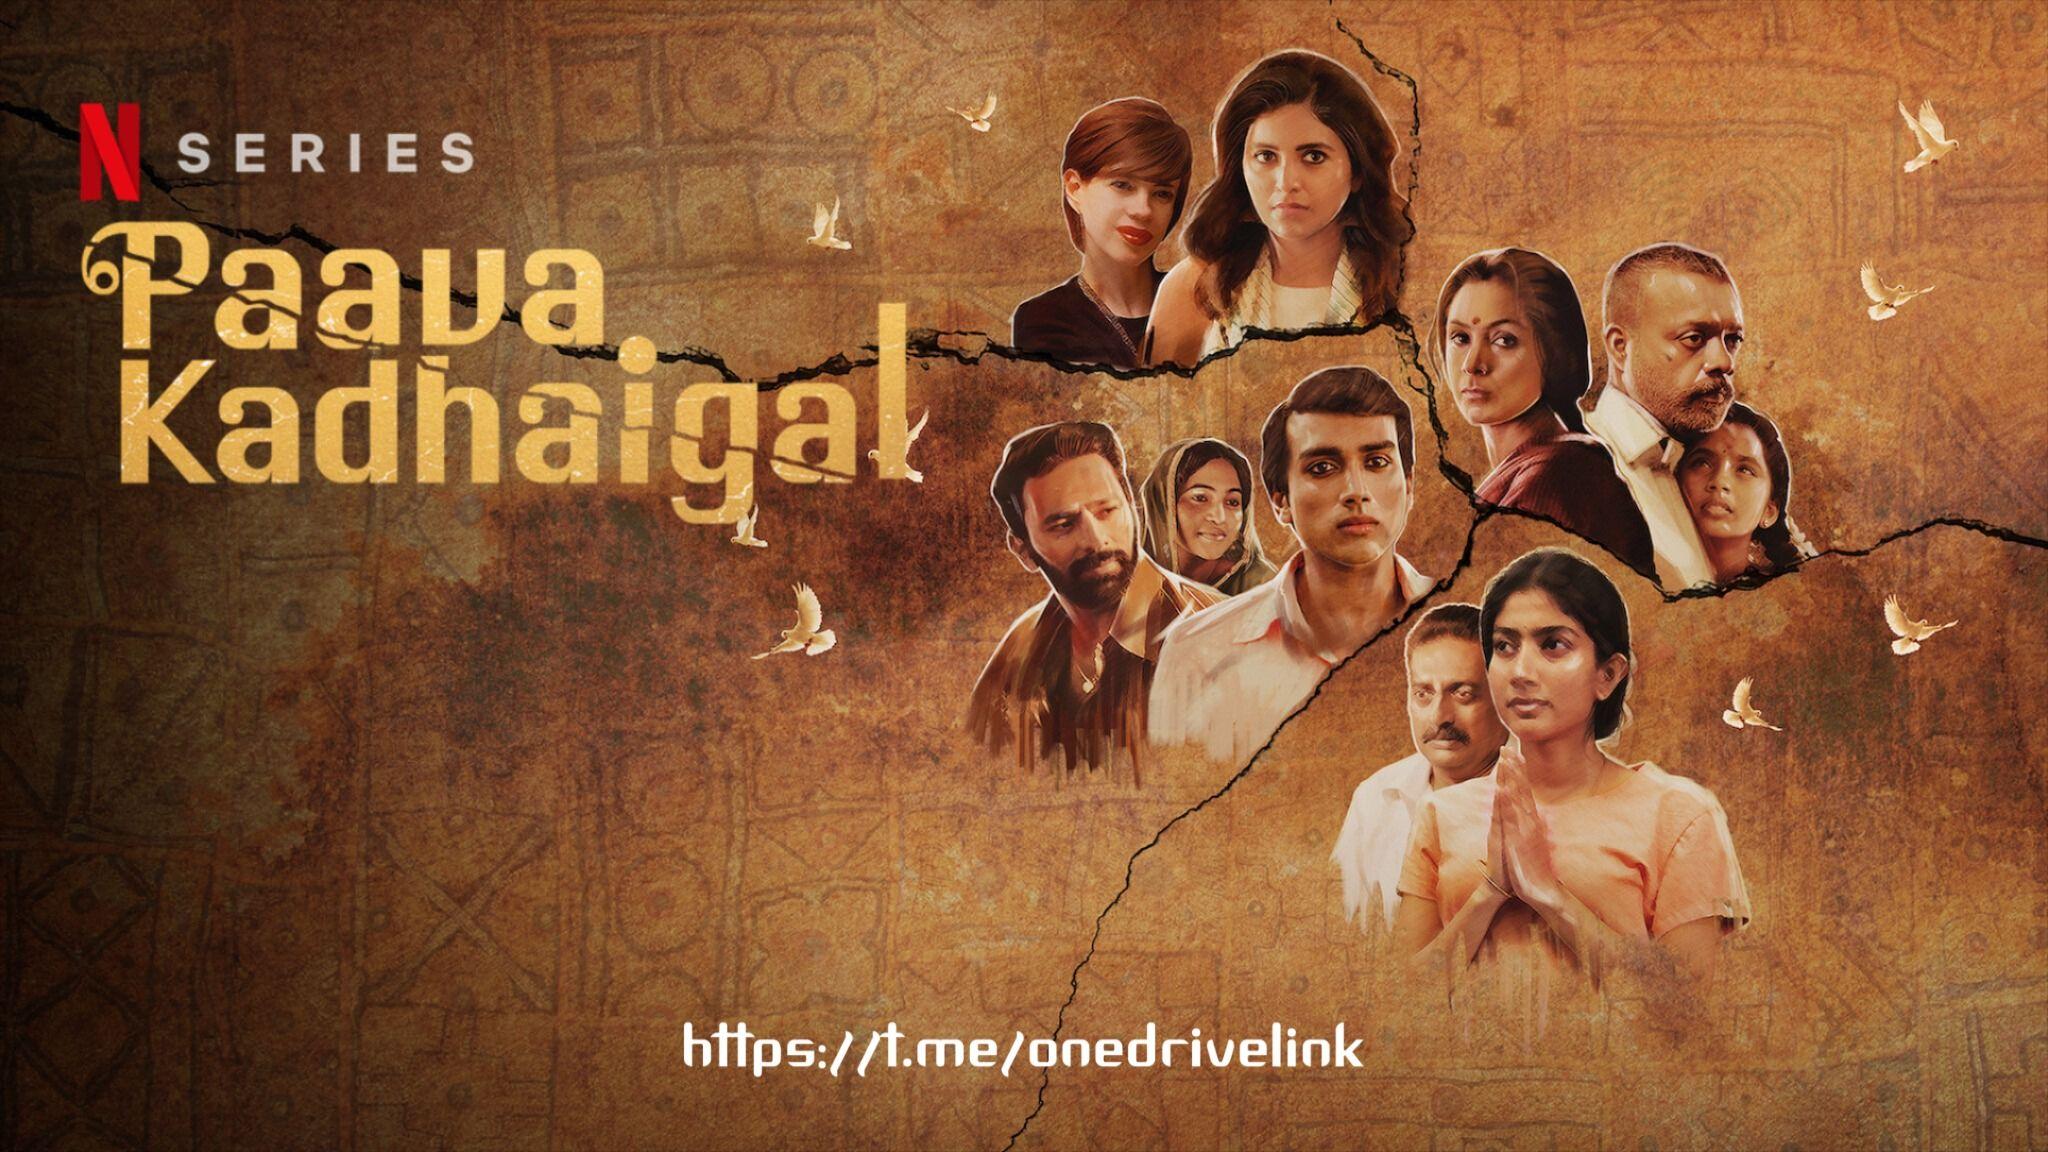 Download Paava Kadhaigal Season 1 Netflix Full Webseries Prejudice Premiere Tales